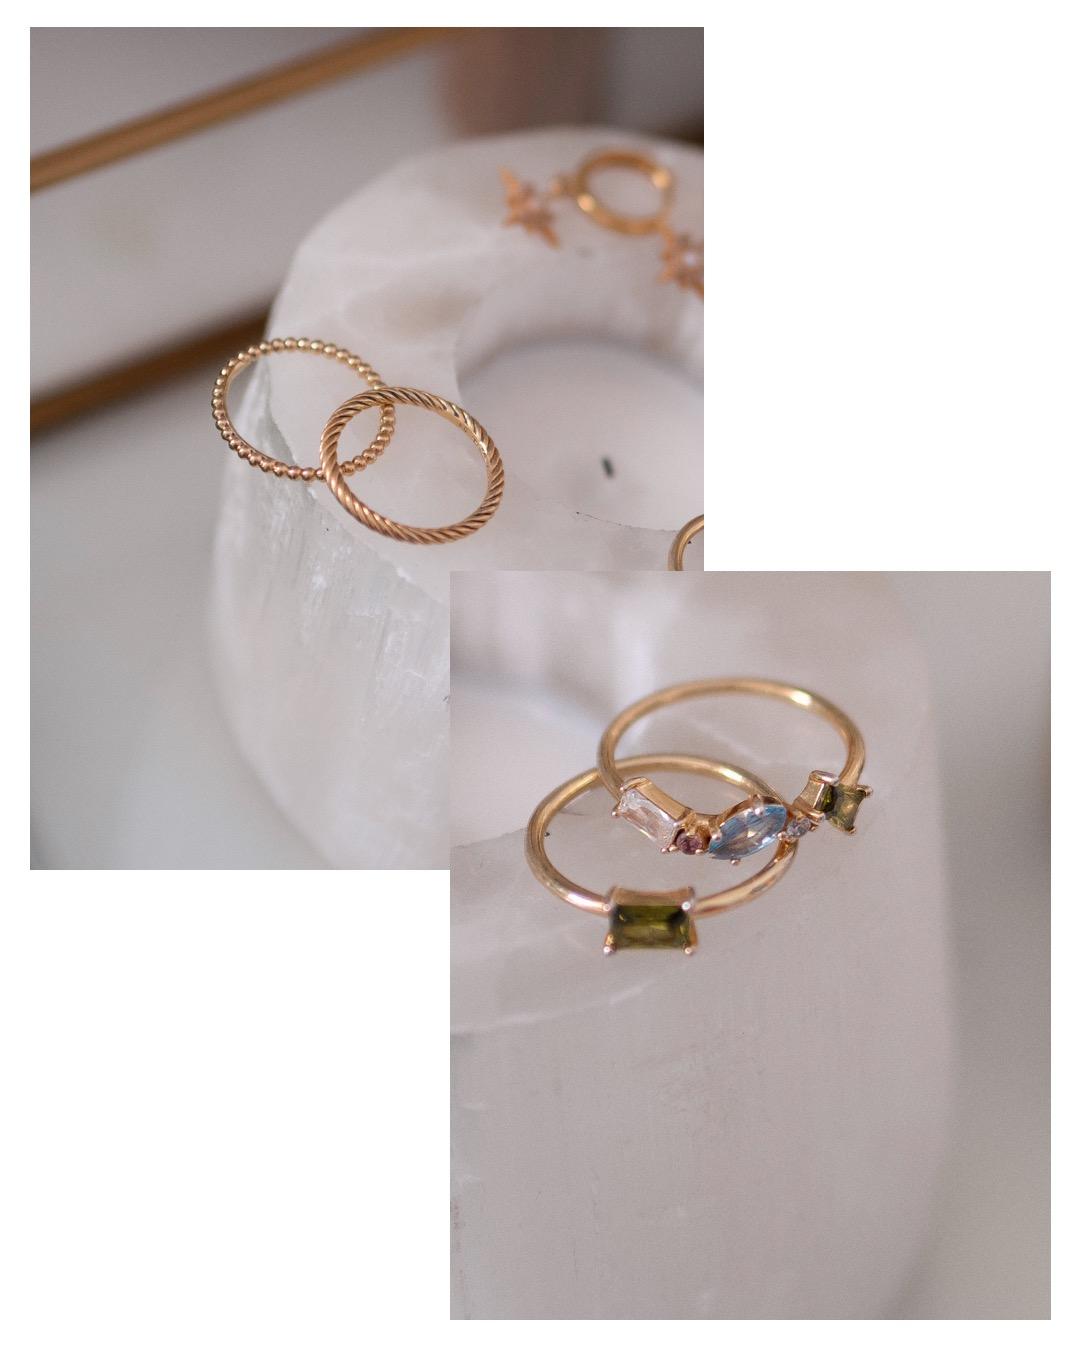 Wanderlust + Co Kaia Gold Ring Set